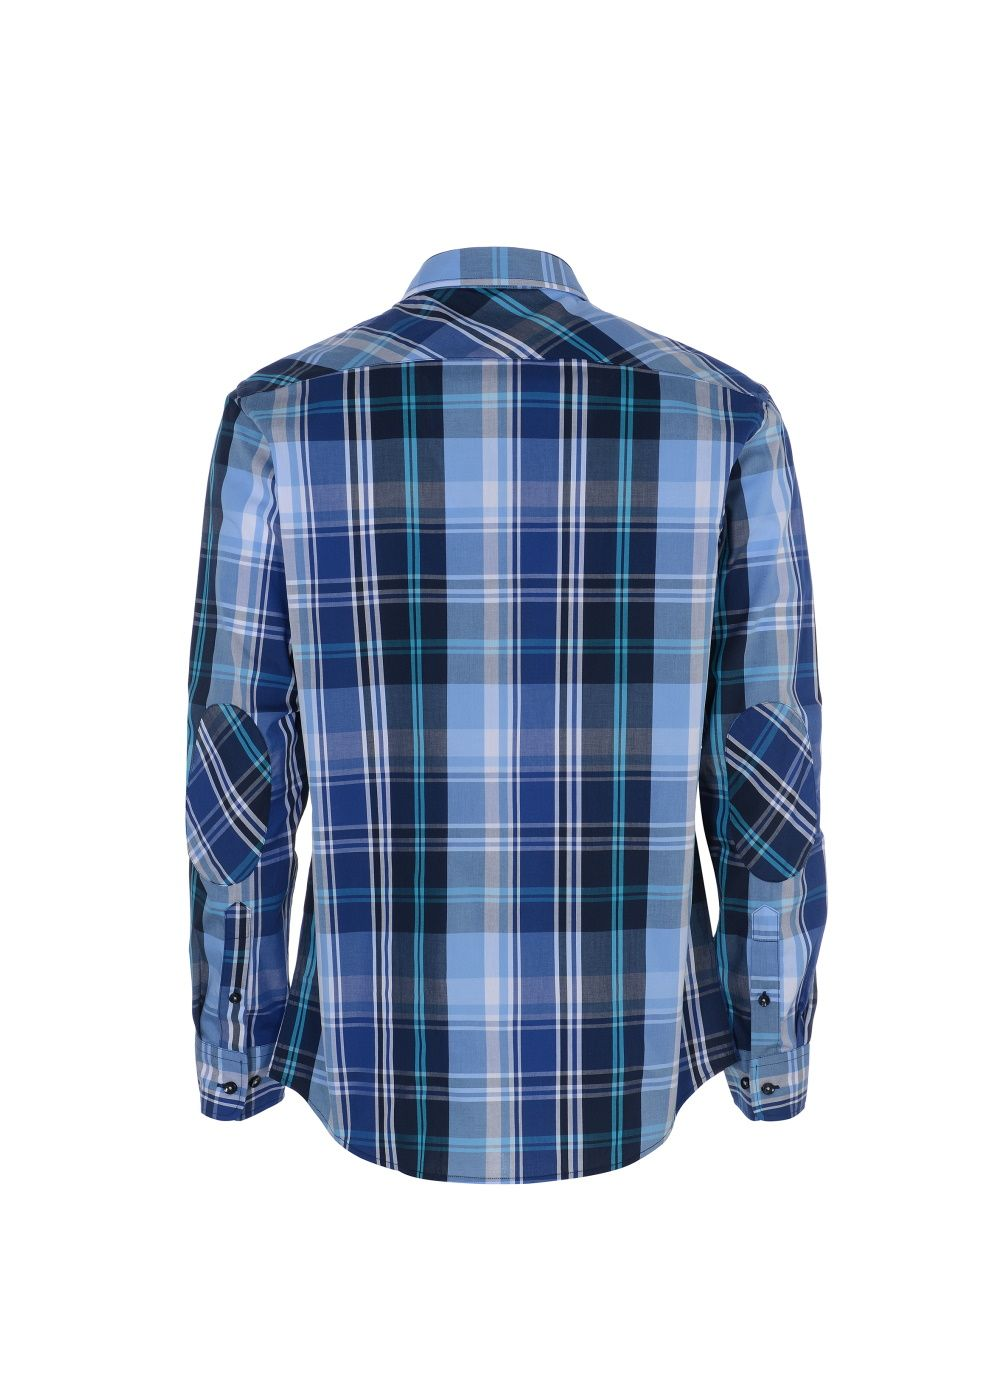 Koszula męska KOSMT-0174-61(W20)